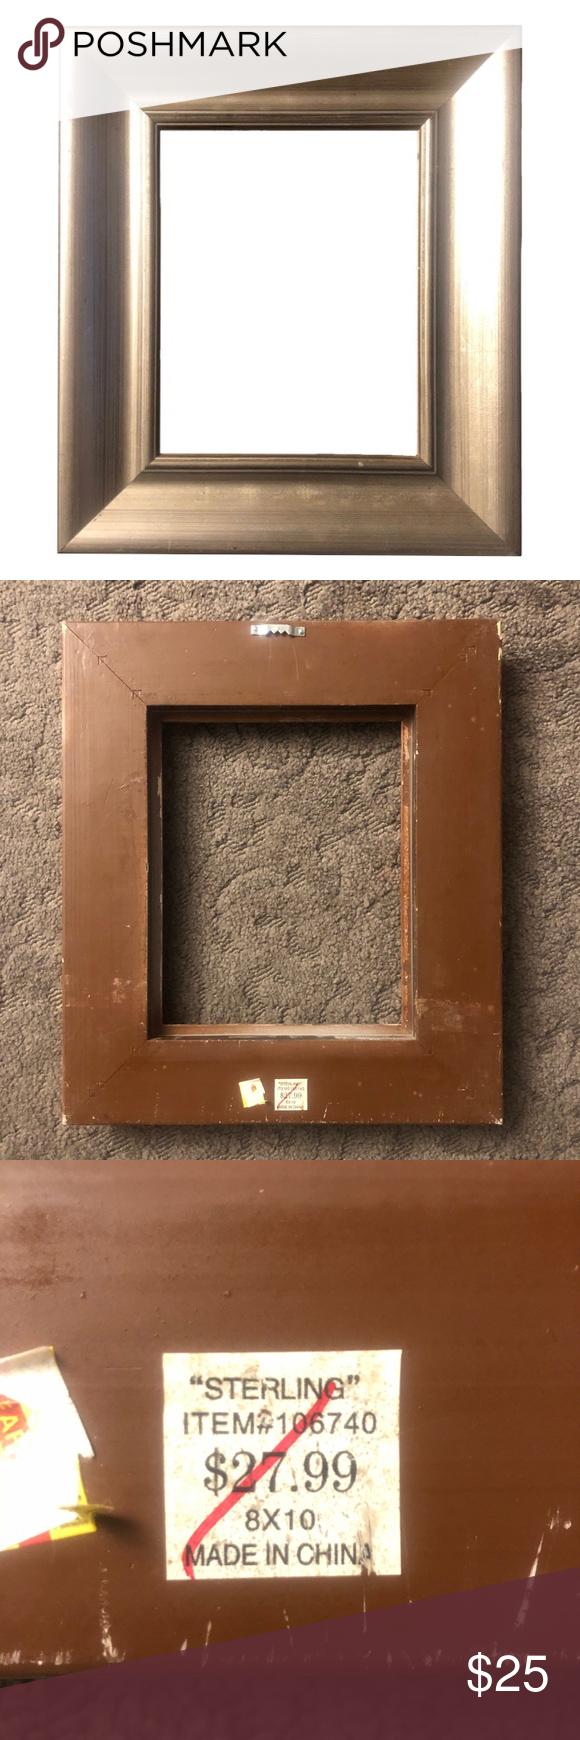 Sterling 8 X10 Open Back Frame For Wall Art In 2020 Hobby Lobby Wall Art Frames On Wall Frame